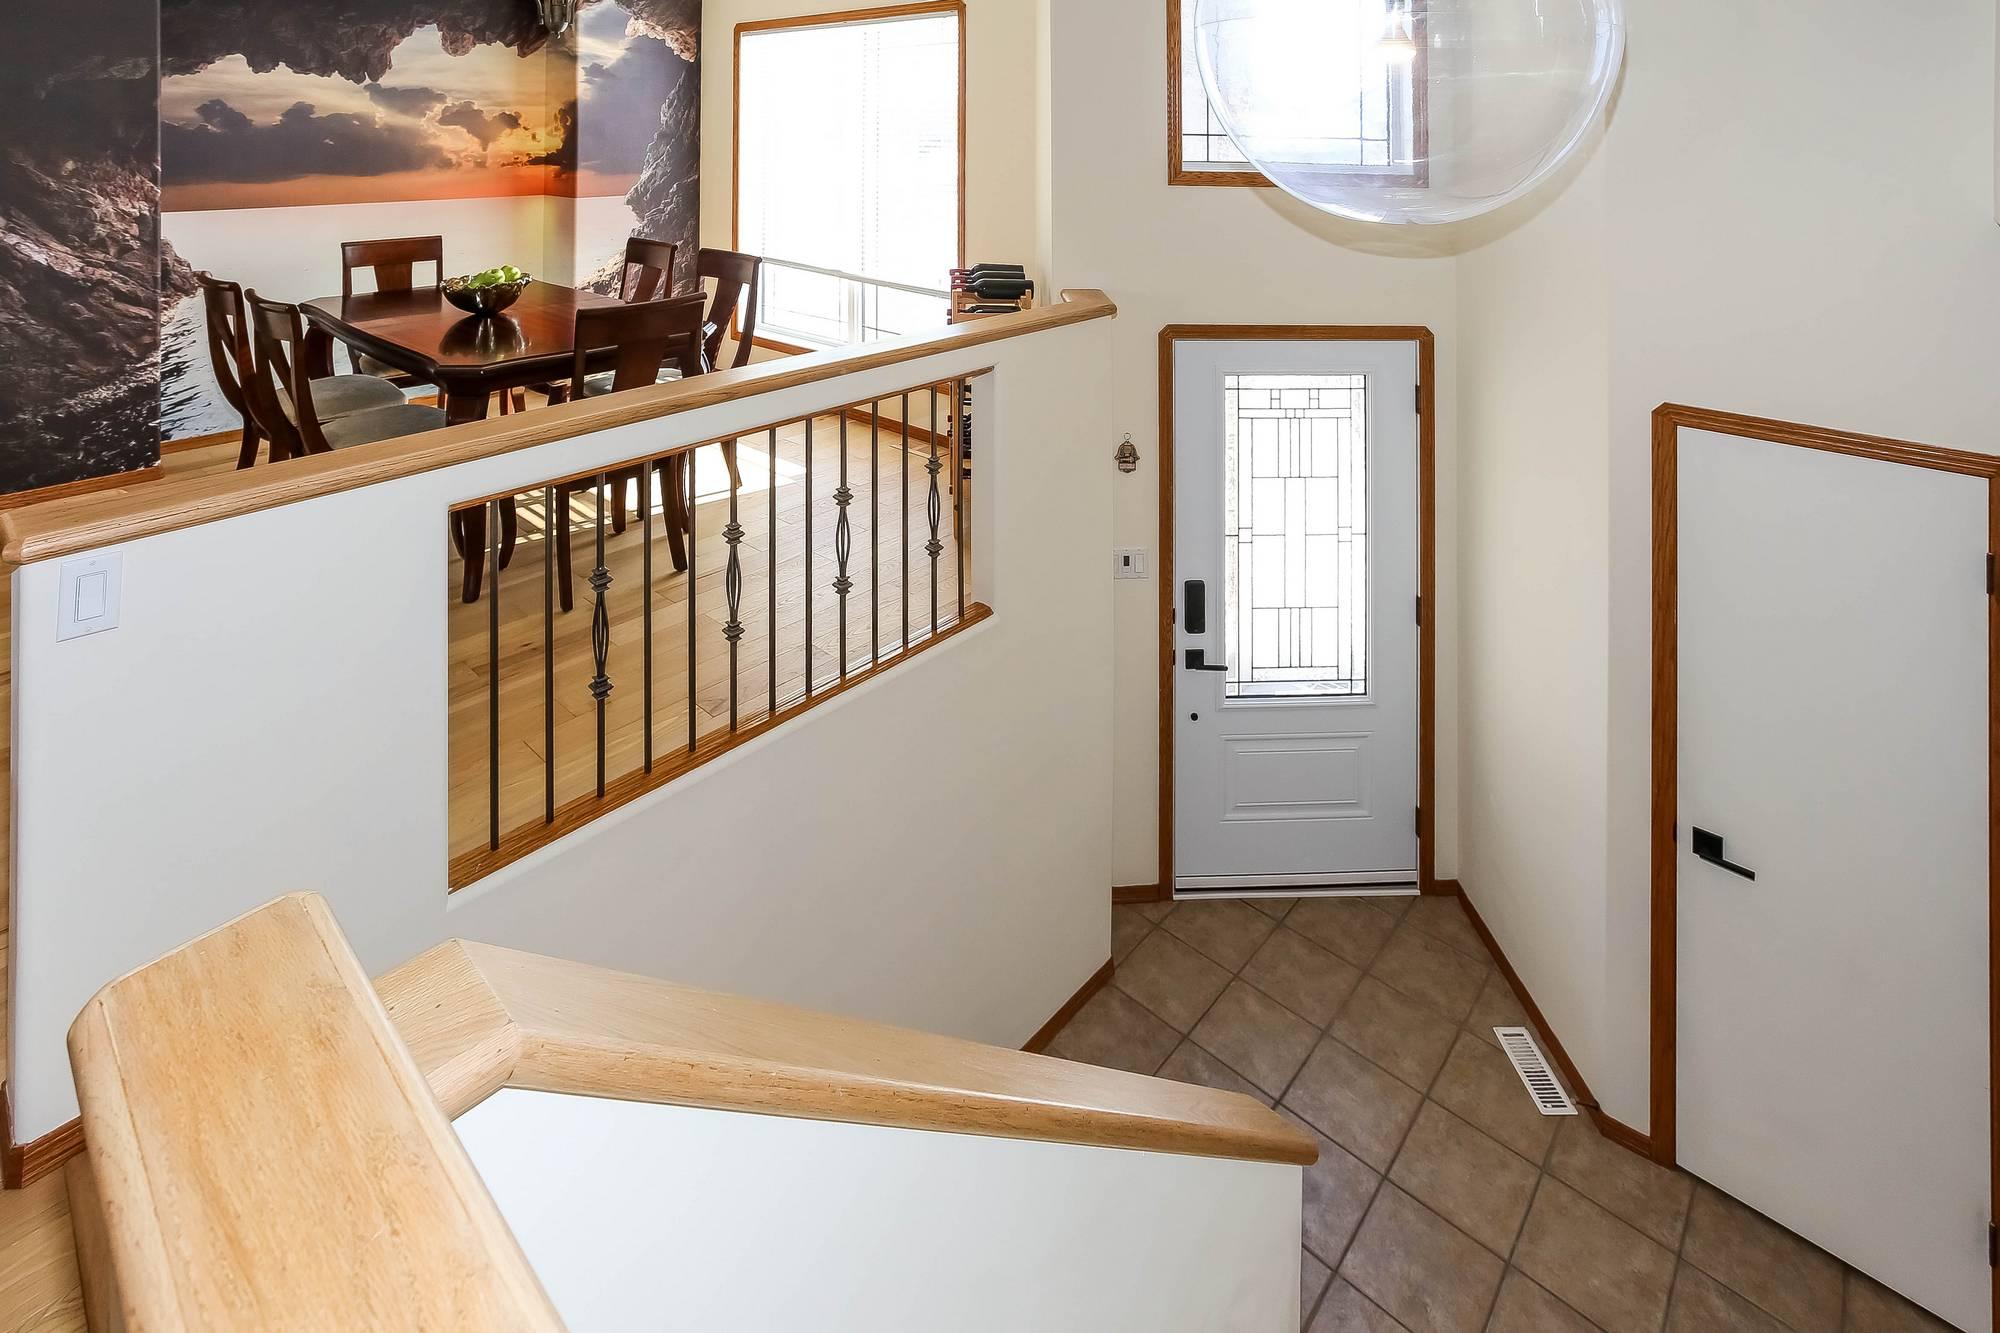 69 Laurel Ridge Drive, Winnipeg, Manitoba  R3Y 1X1 - Photo 3 - 202003693